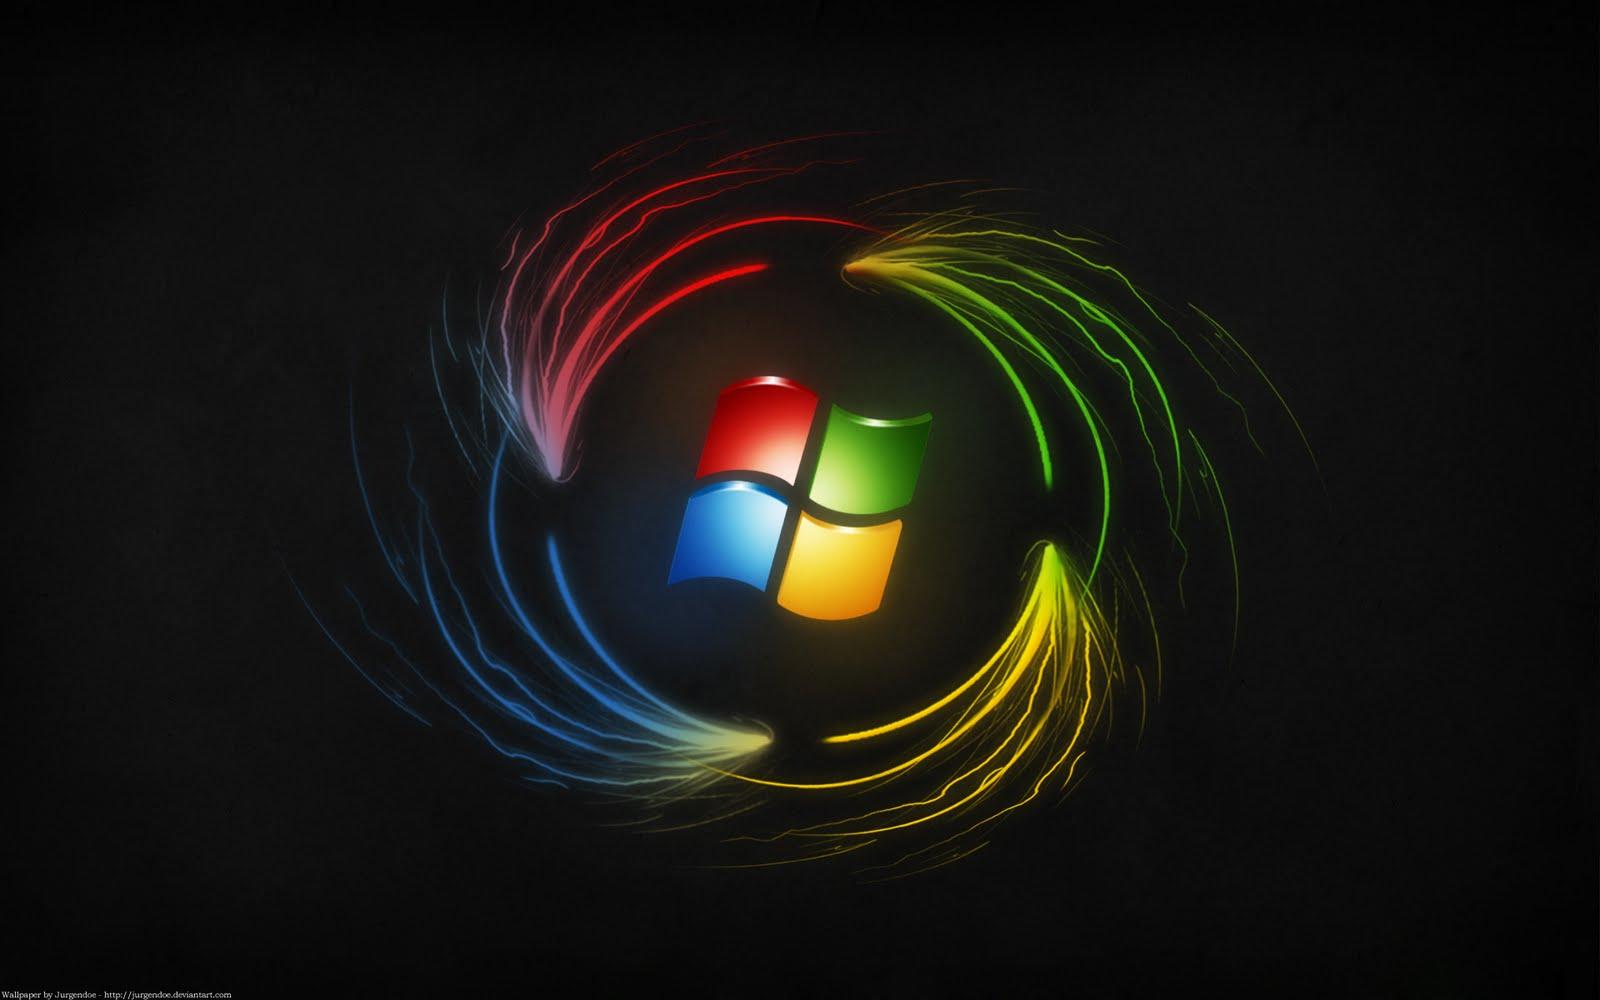 Free Download Wallpaper HD : windows 8 new wallpaper hd for desktop free 1080p download